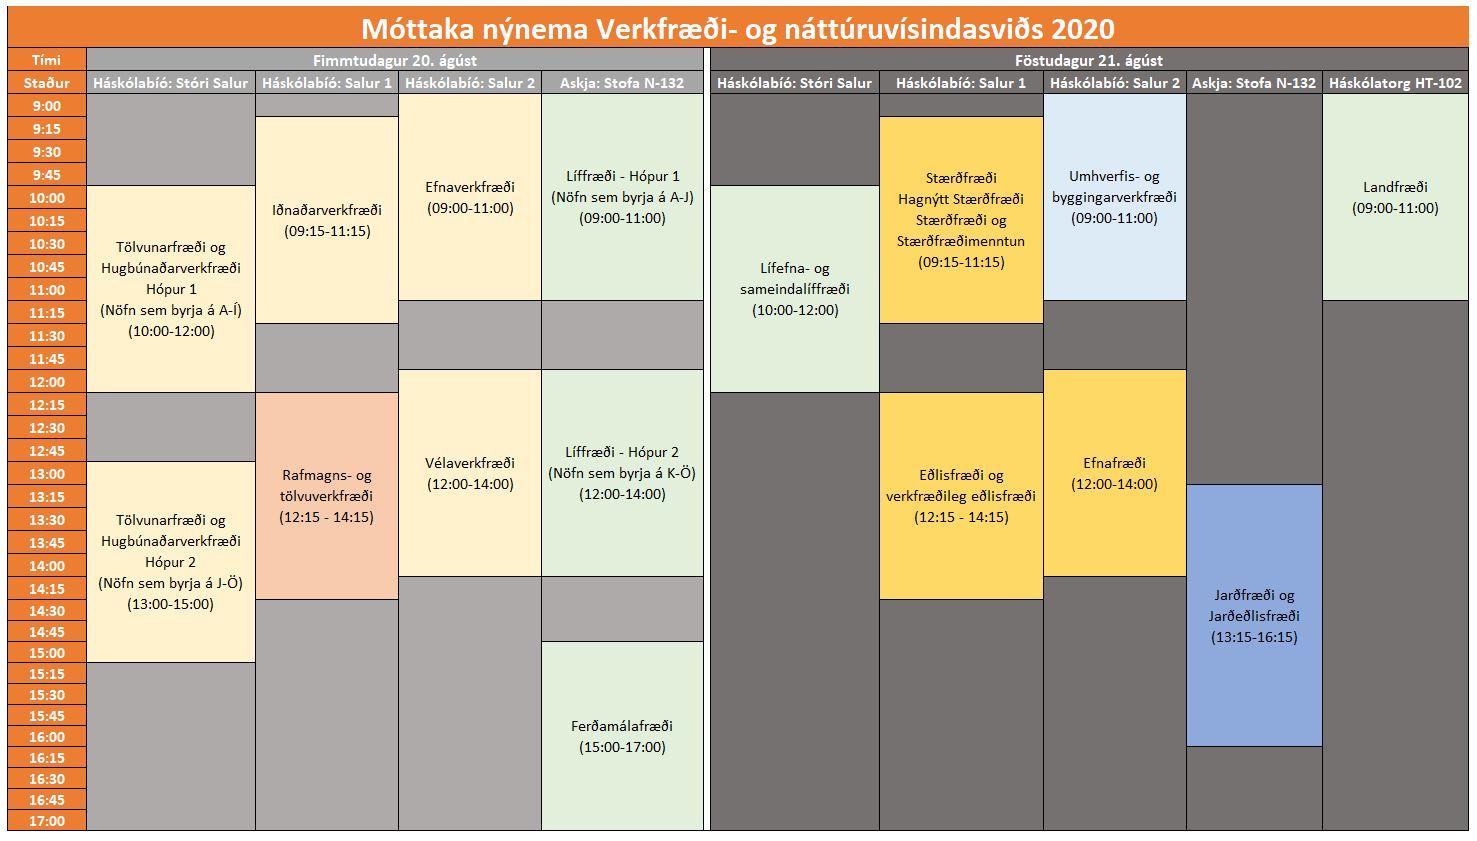 https://www.hi.is/sites/default/files/davidfa/mottaka_nynema_tafla_af_skipulagi_uppfaert_18.08.2020_13.28.jpg